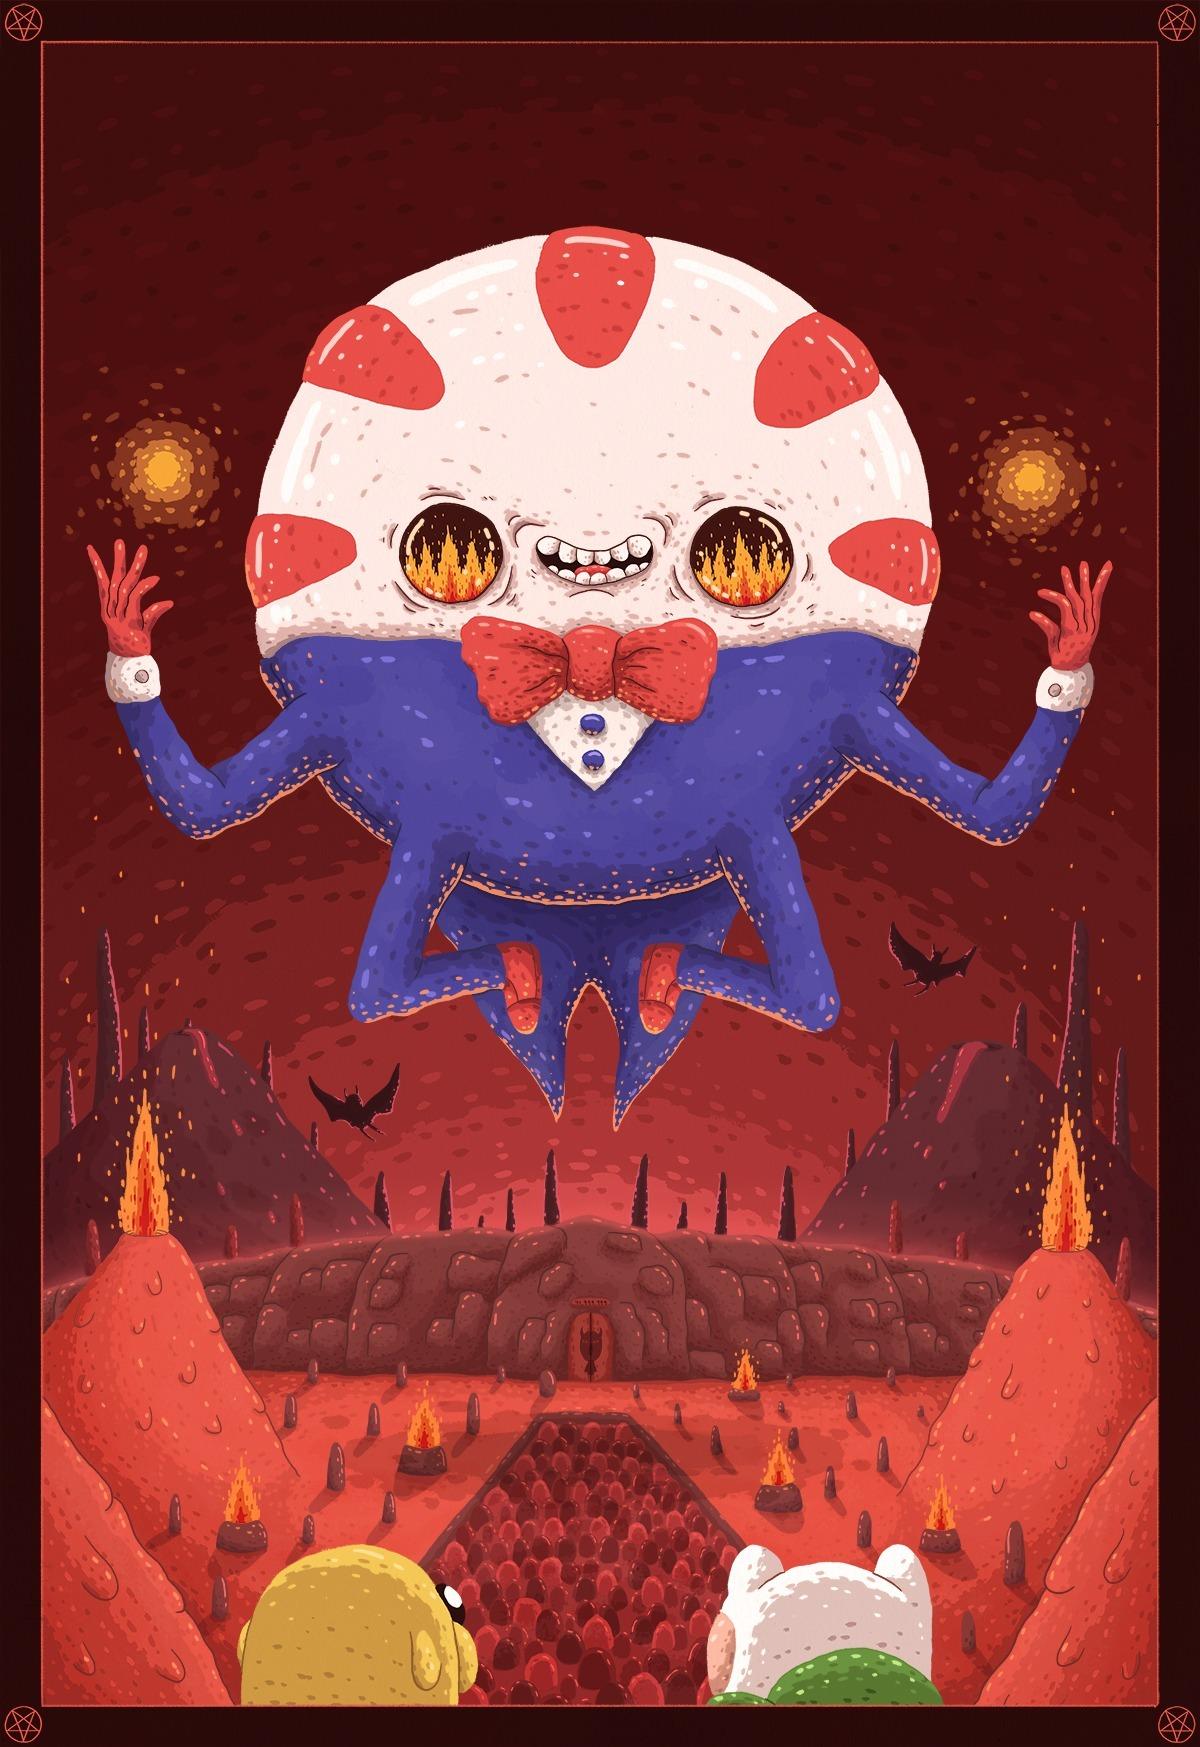 Peppermint Butler: True Ruler of the Nightosphere https://www.behance.net/gallery/16081659/Adventure-Time-Tribute  Submitted by stevendarden